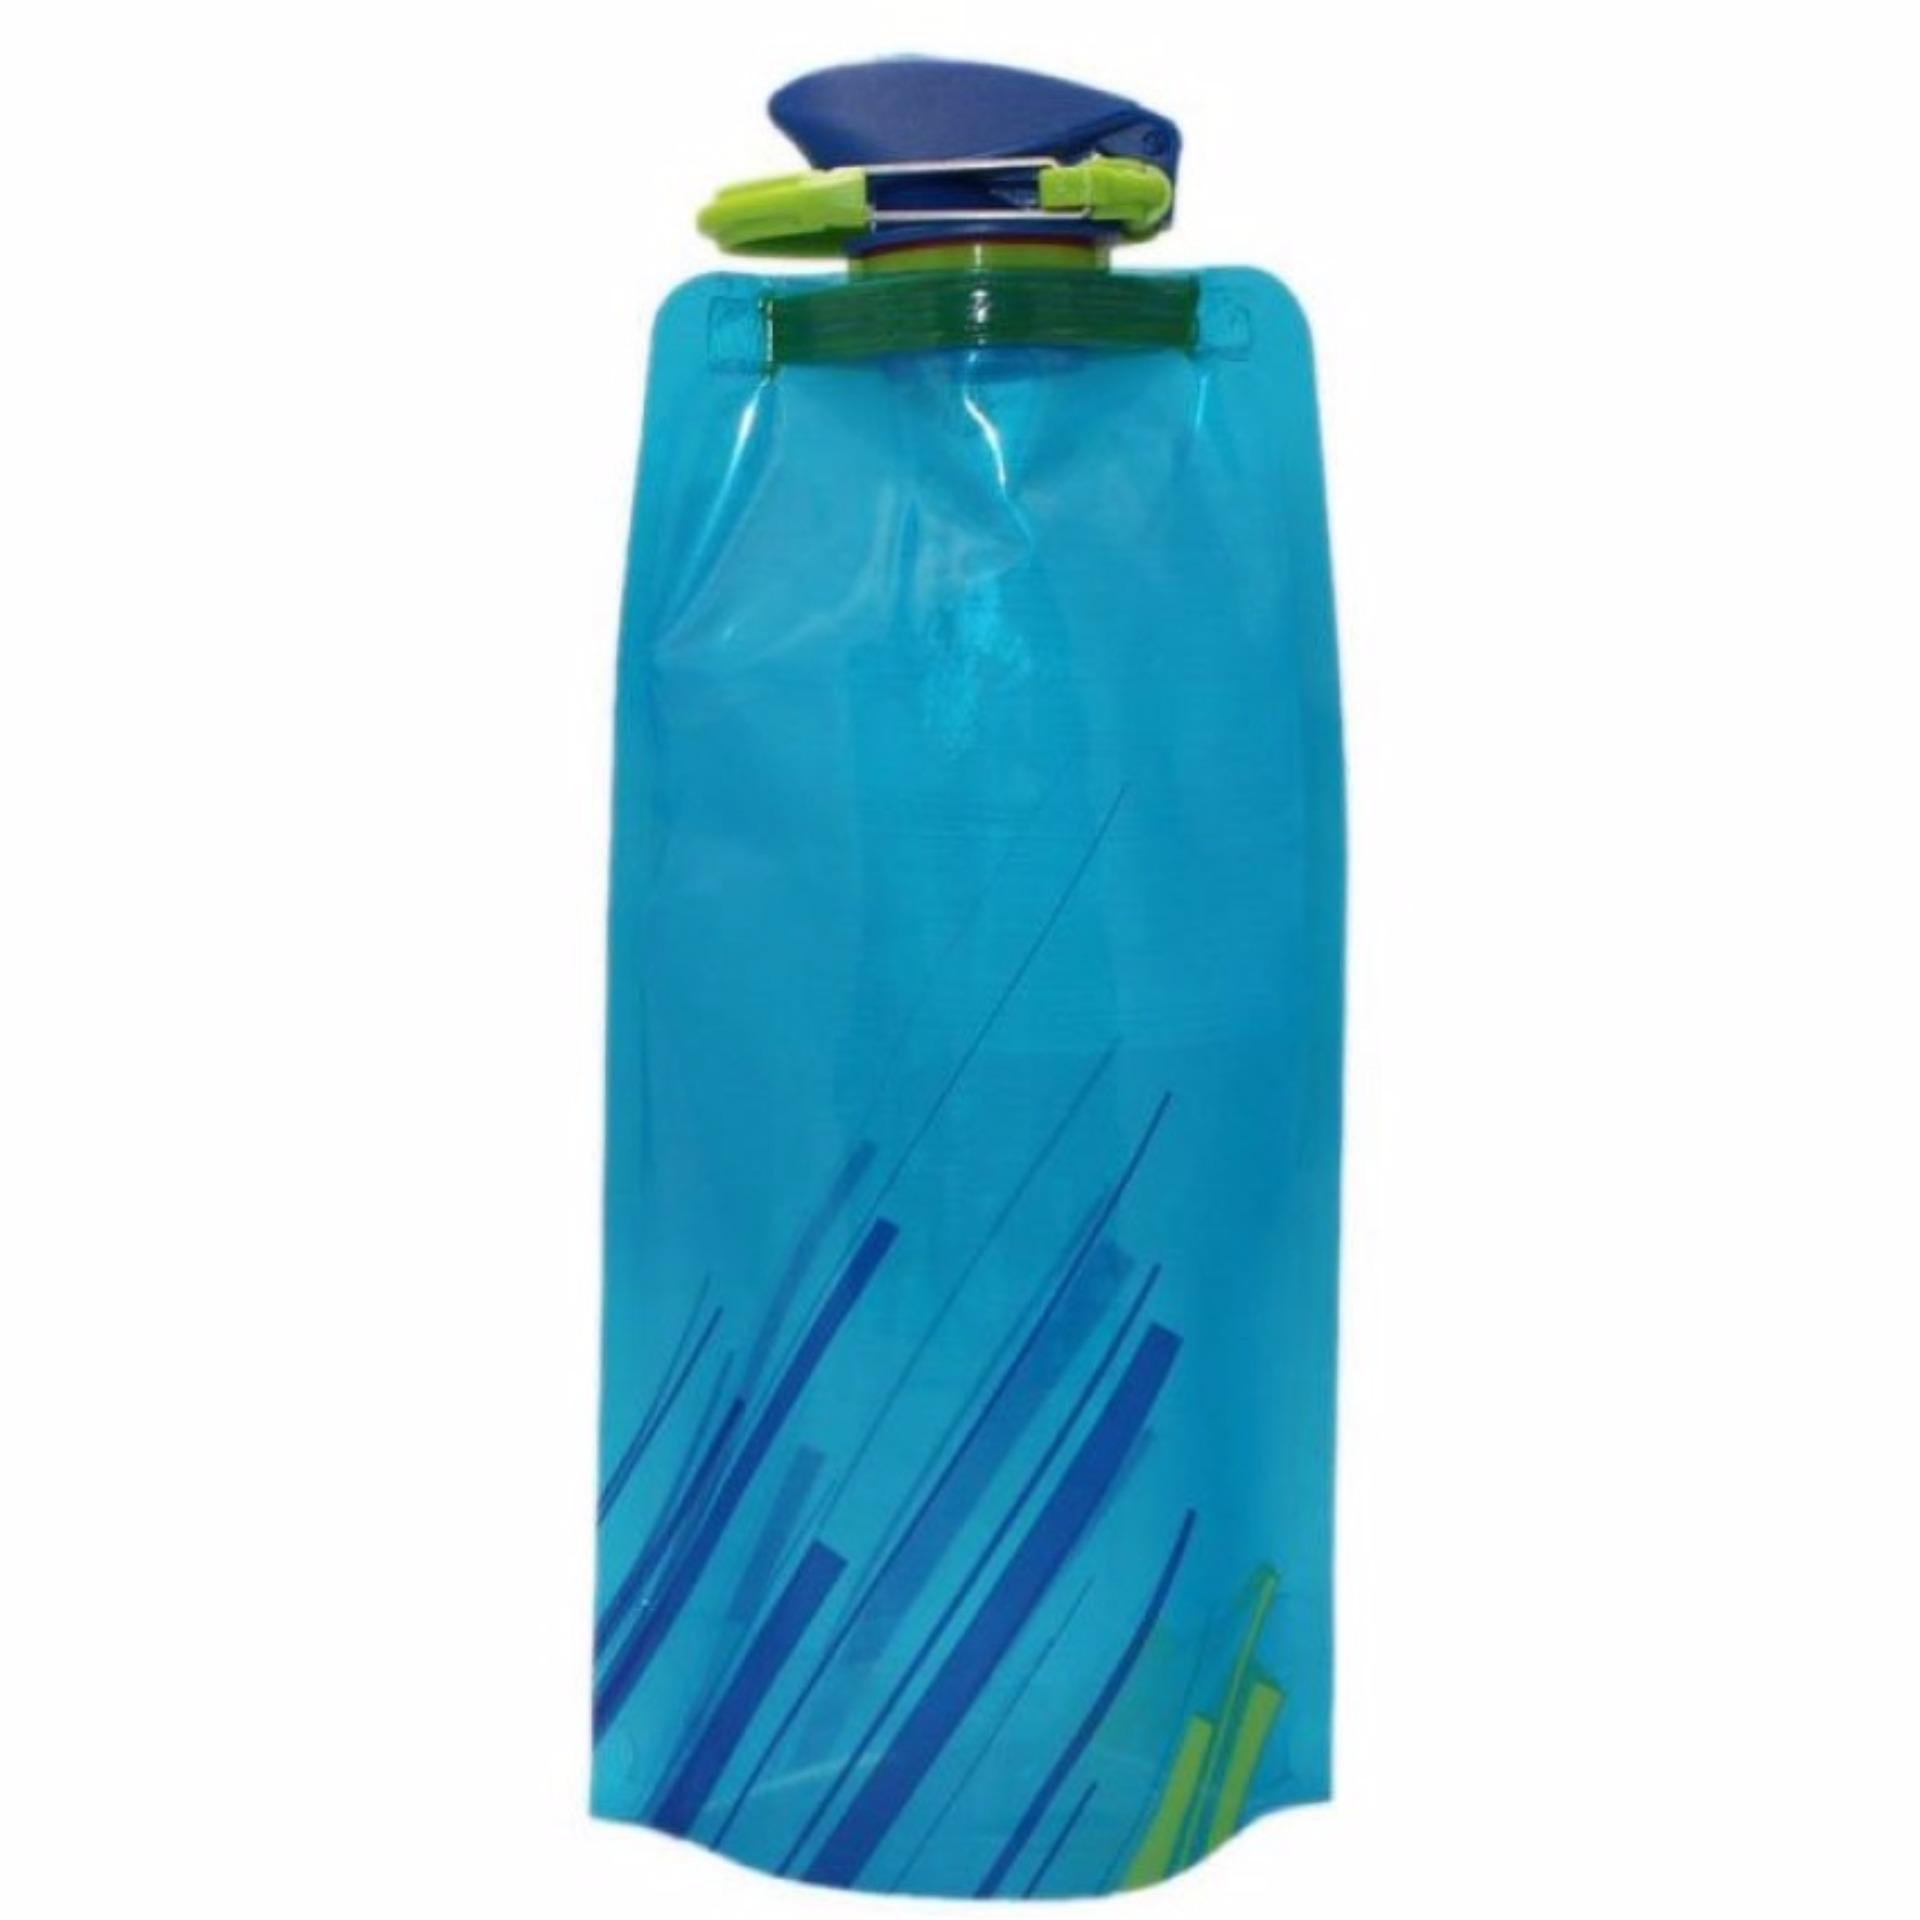 Eigia Botol Minum Lipat Camping Hiking Adventure Outdoor Biking Sport s3343 700ml - Biru